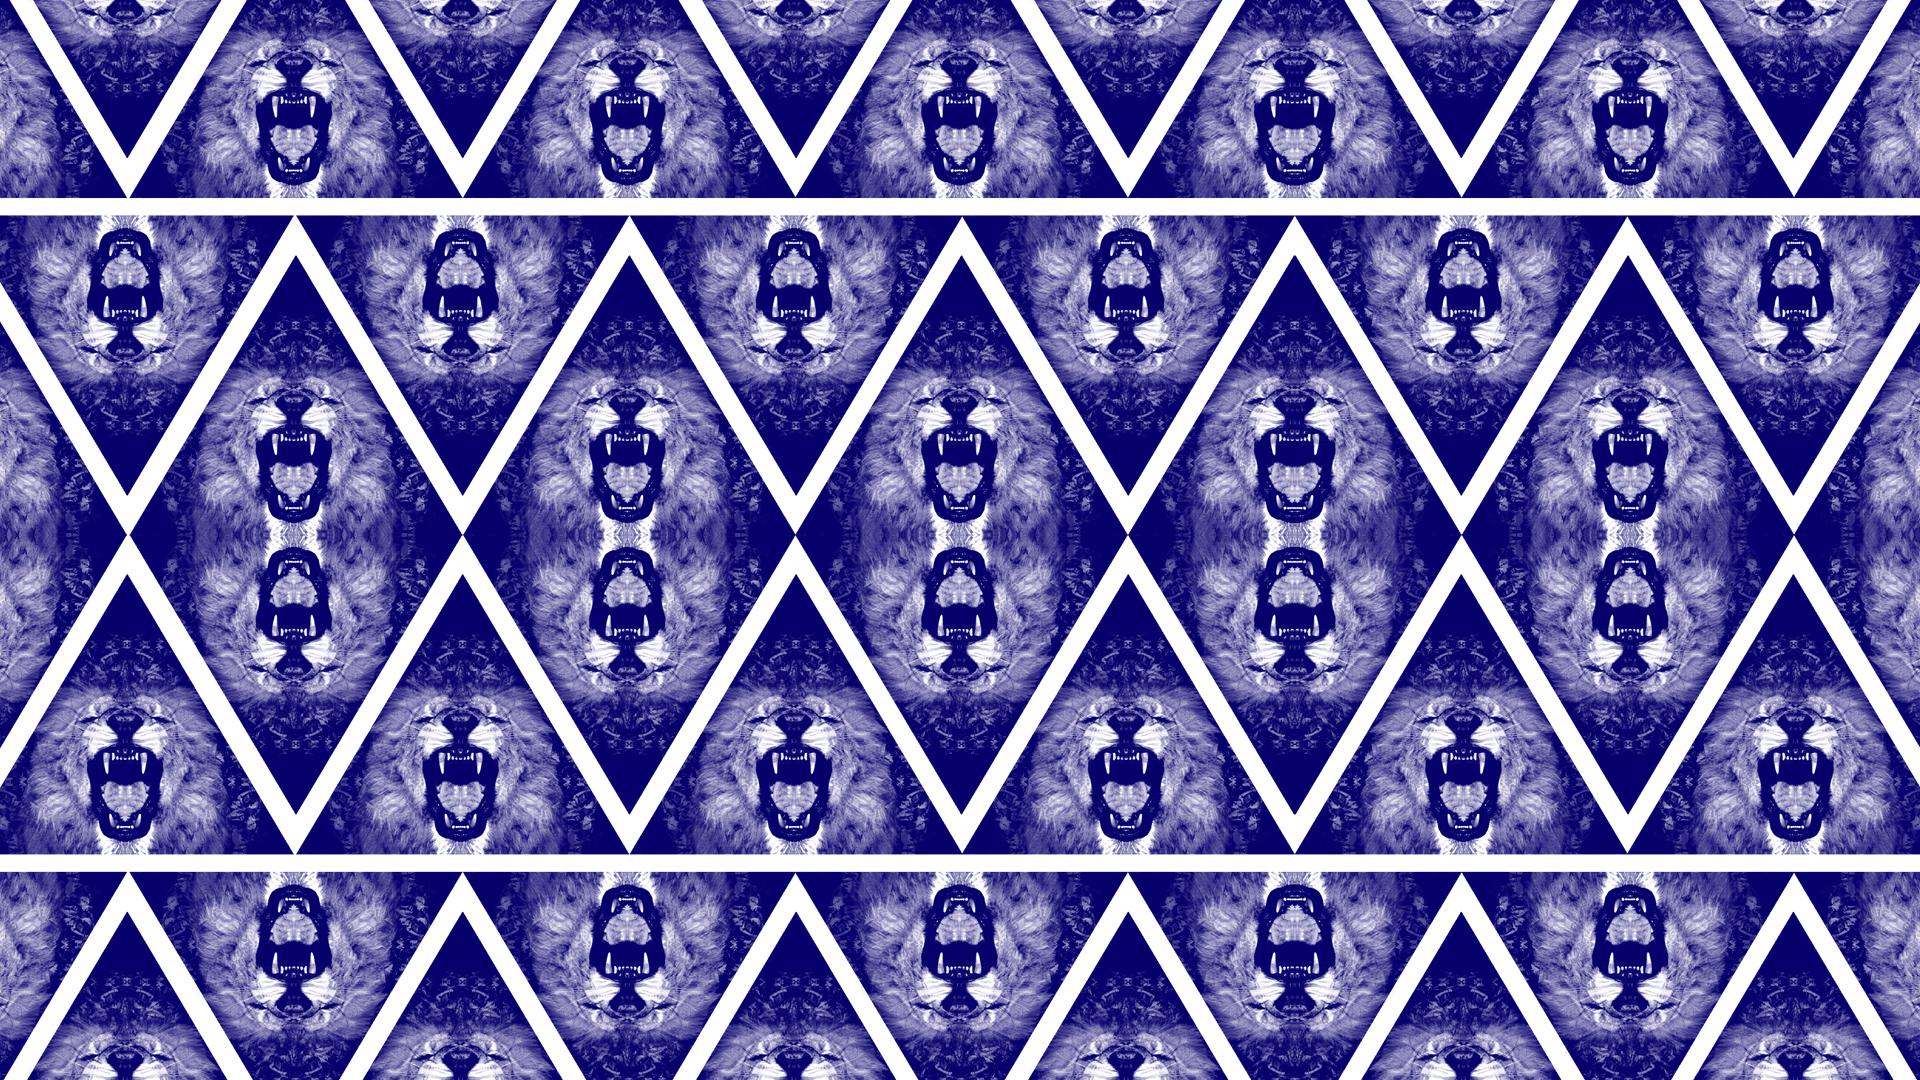 Blue Lion Triangle Bandana Pattern Wallpaper by cugini on DeviantArt